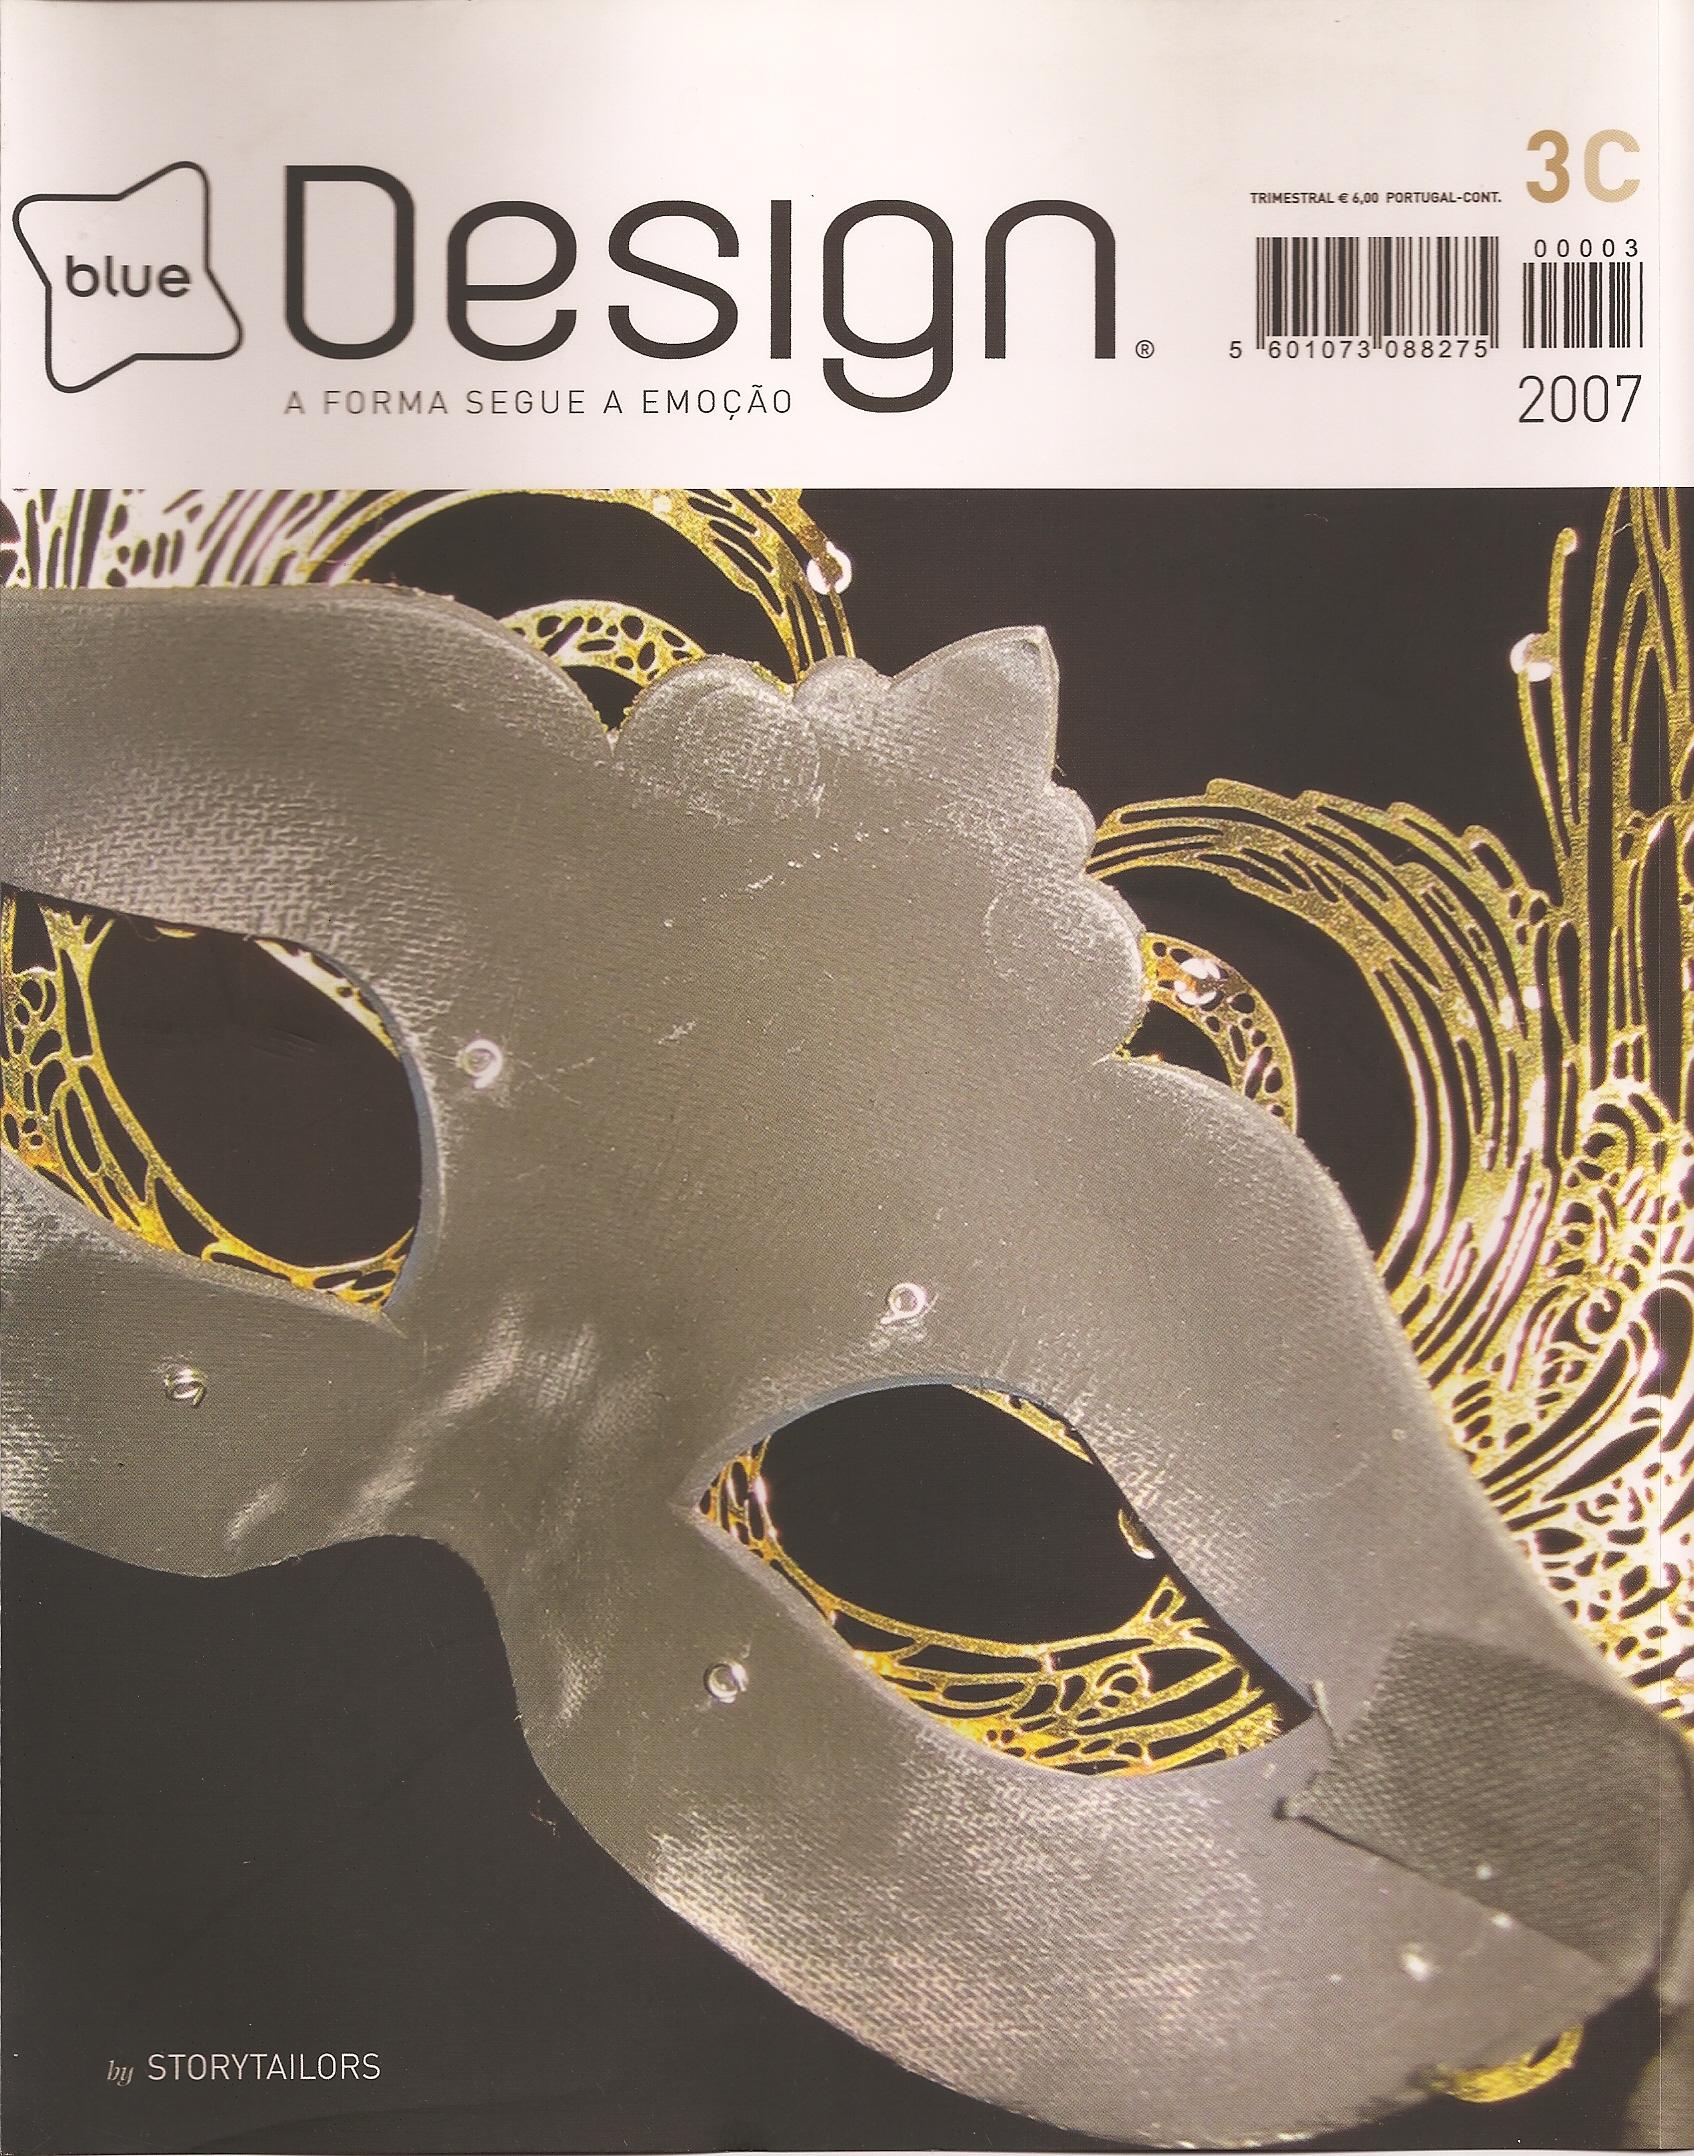 Blue-Desing-#3-cover-2007